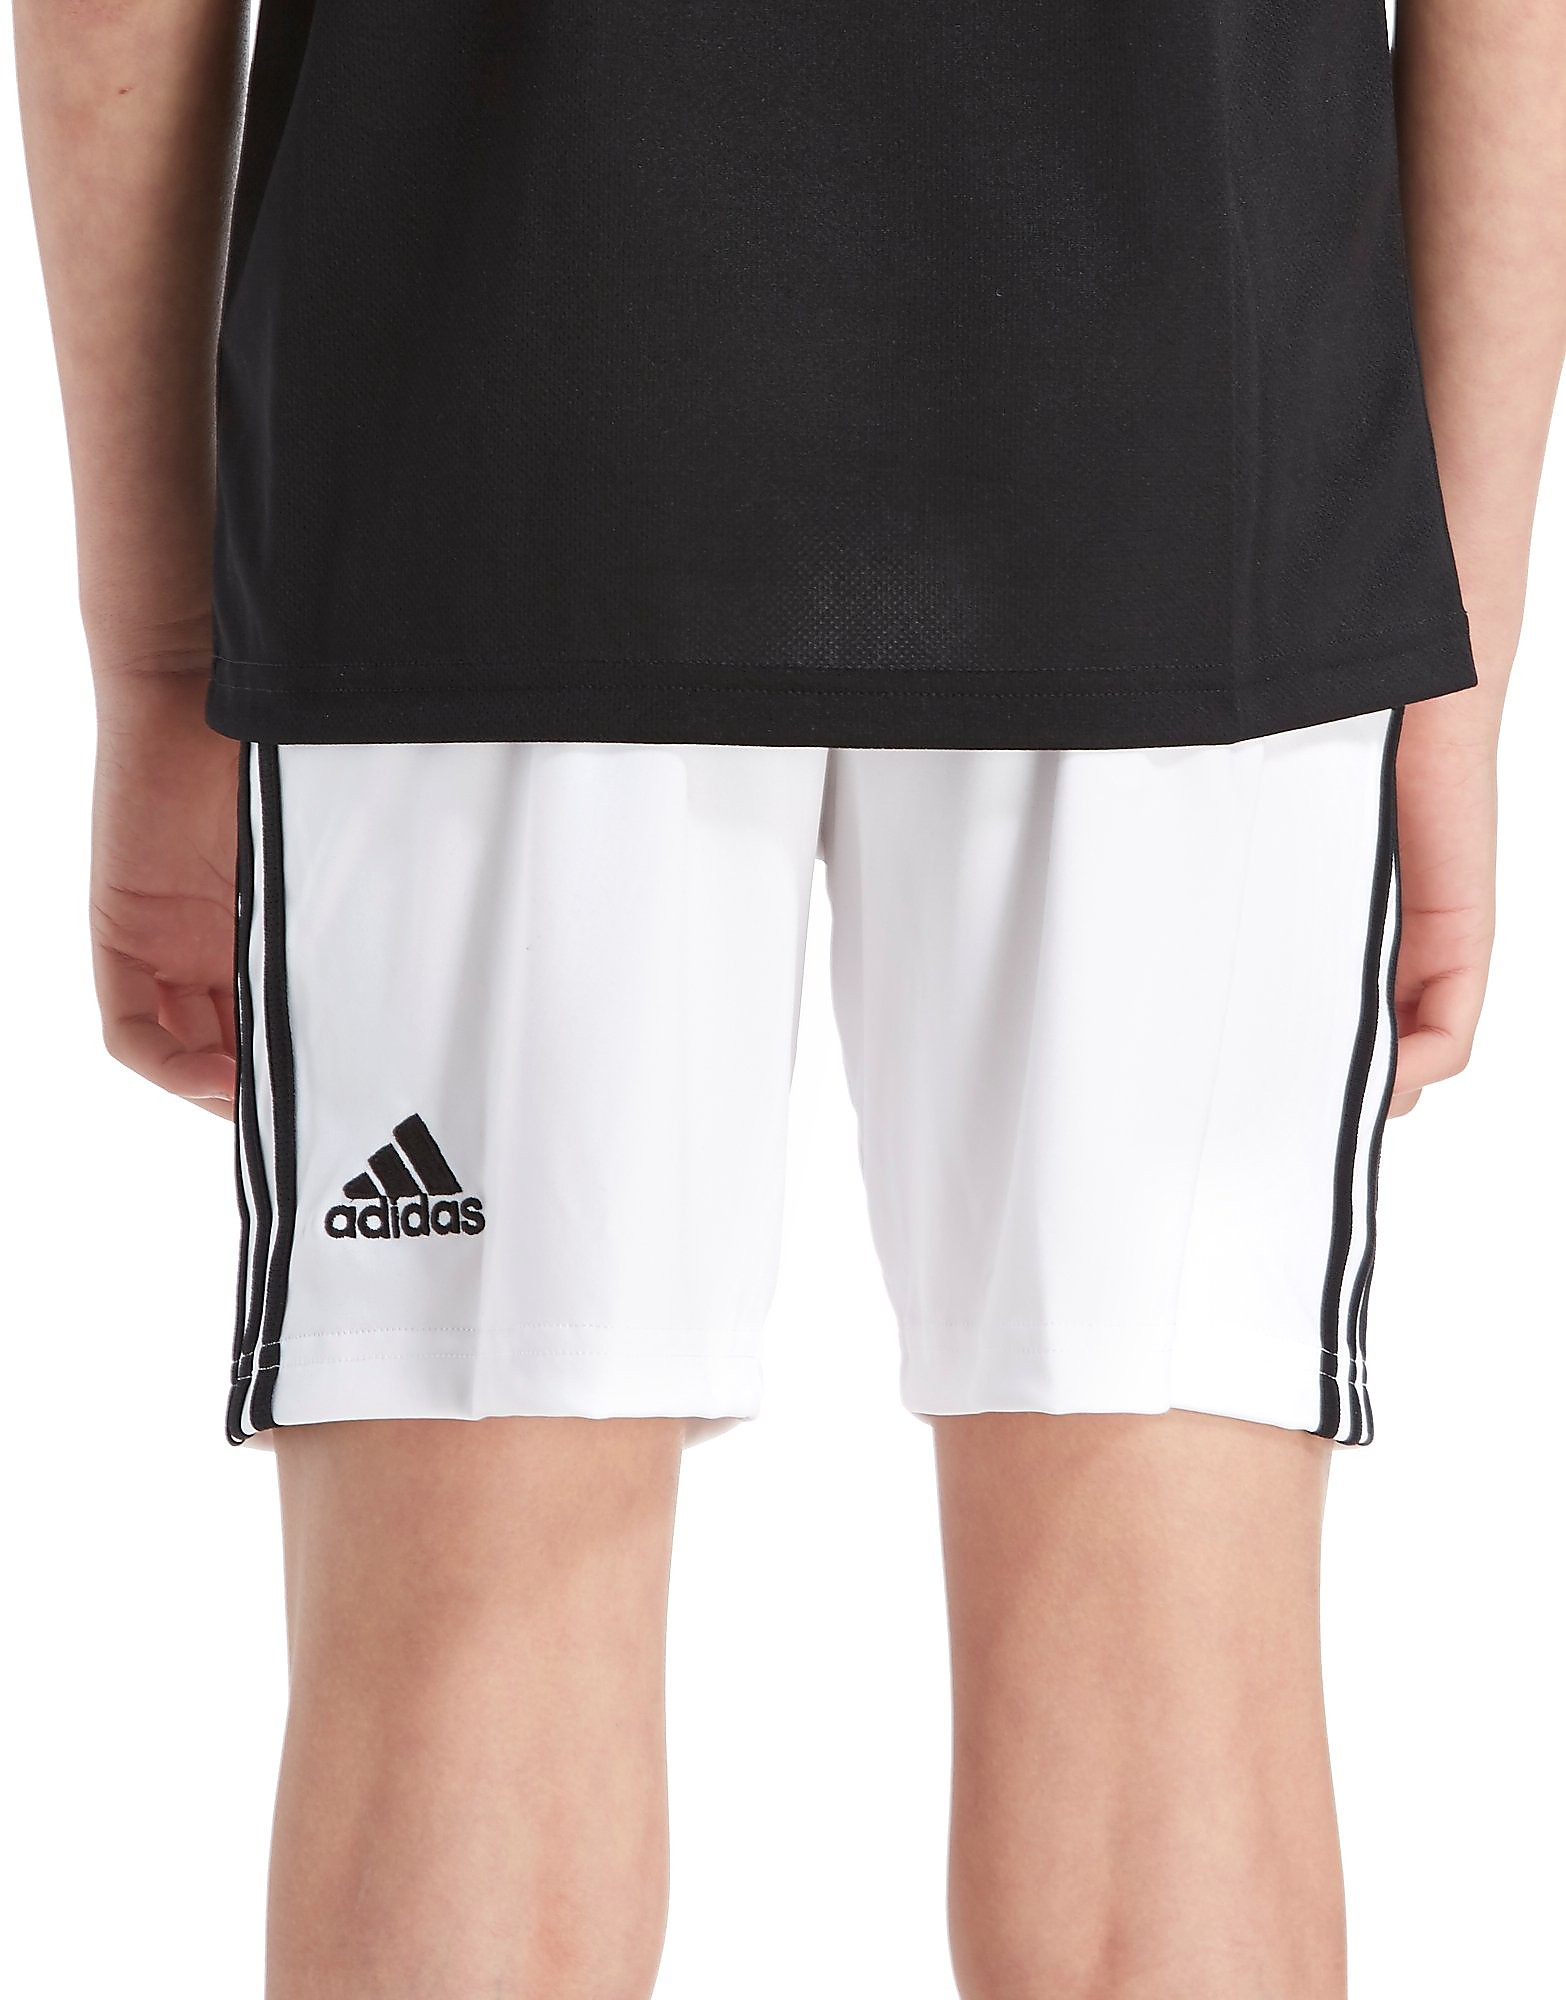 adidas Argentina 2018 Away Shorts Junior